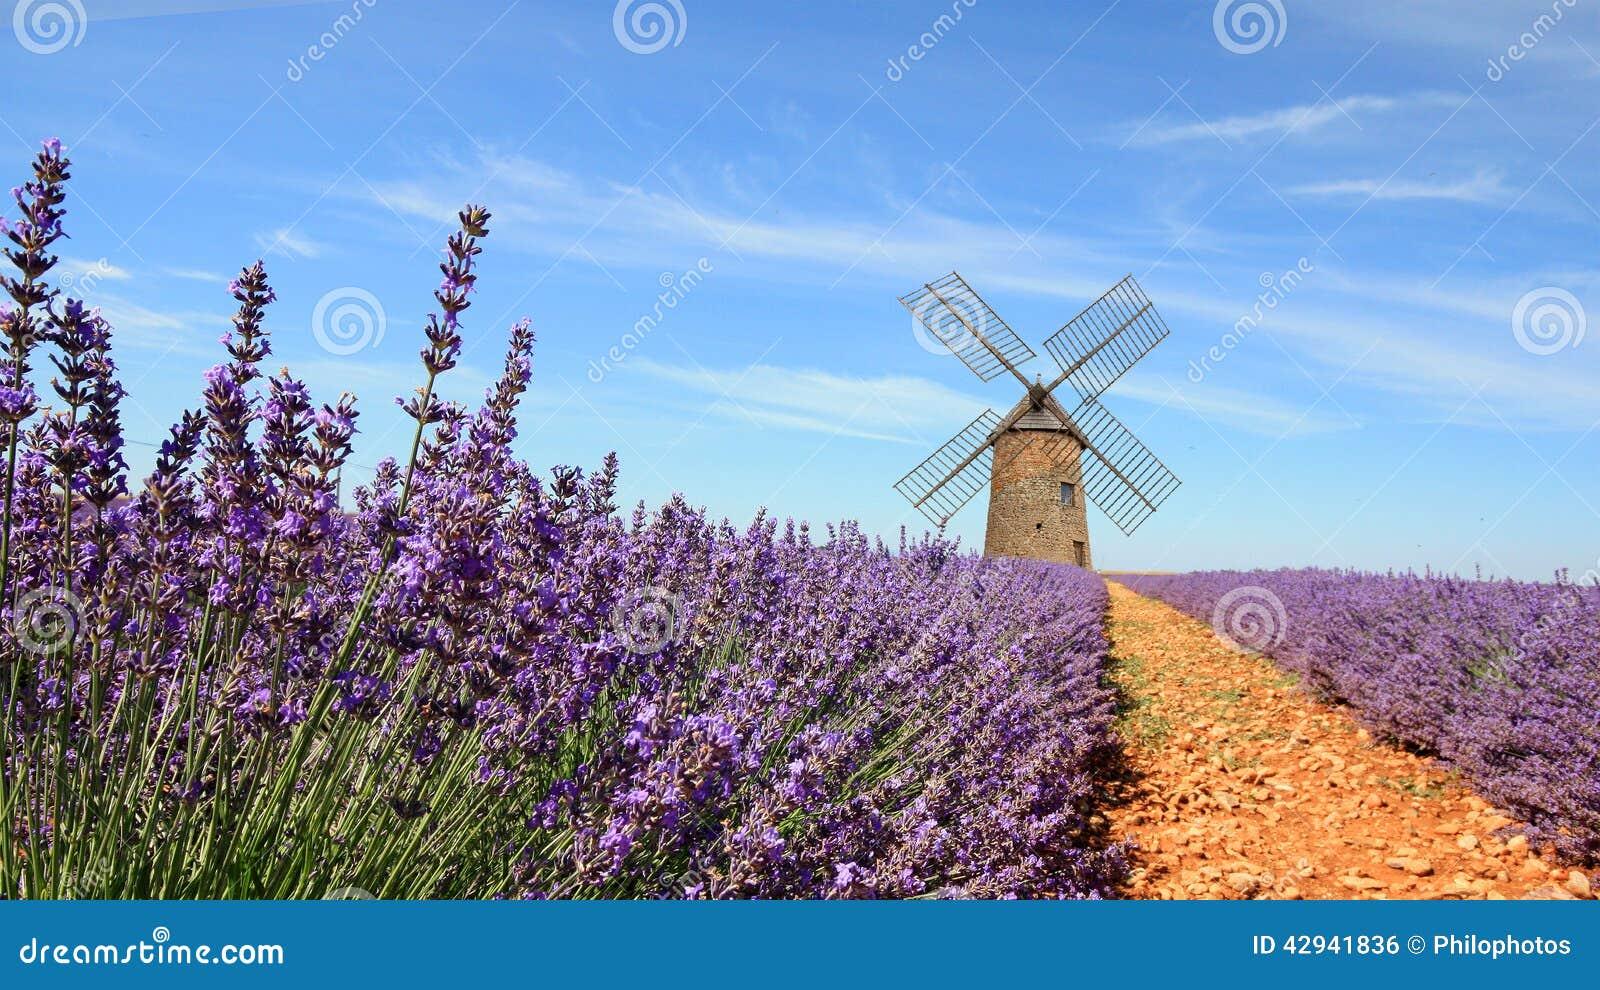 France Valensole Lavandes Stock Photo Image 42941836